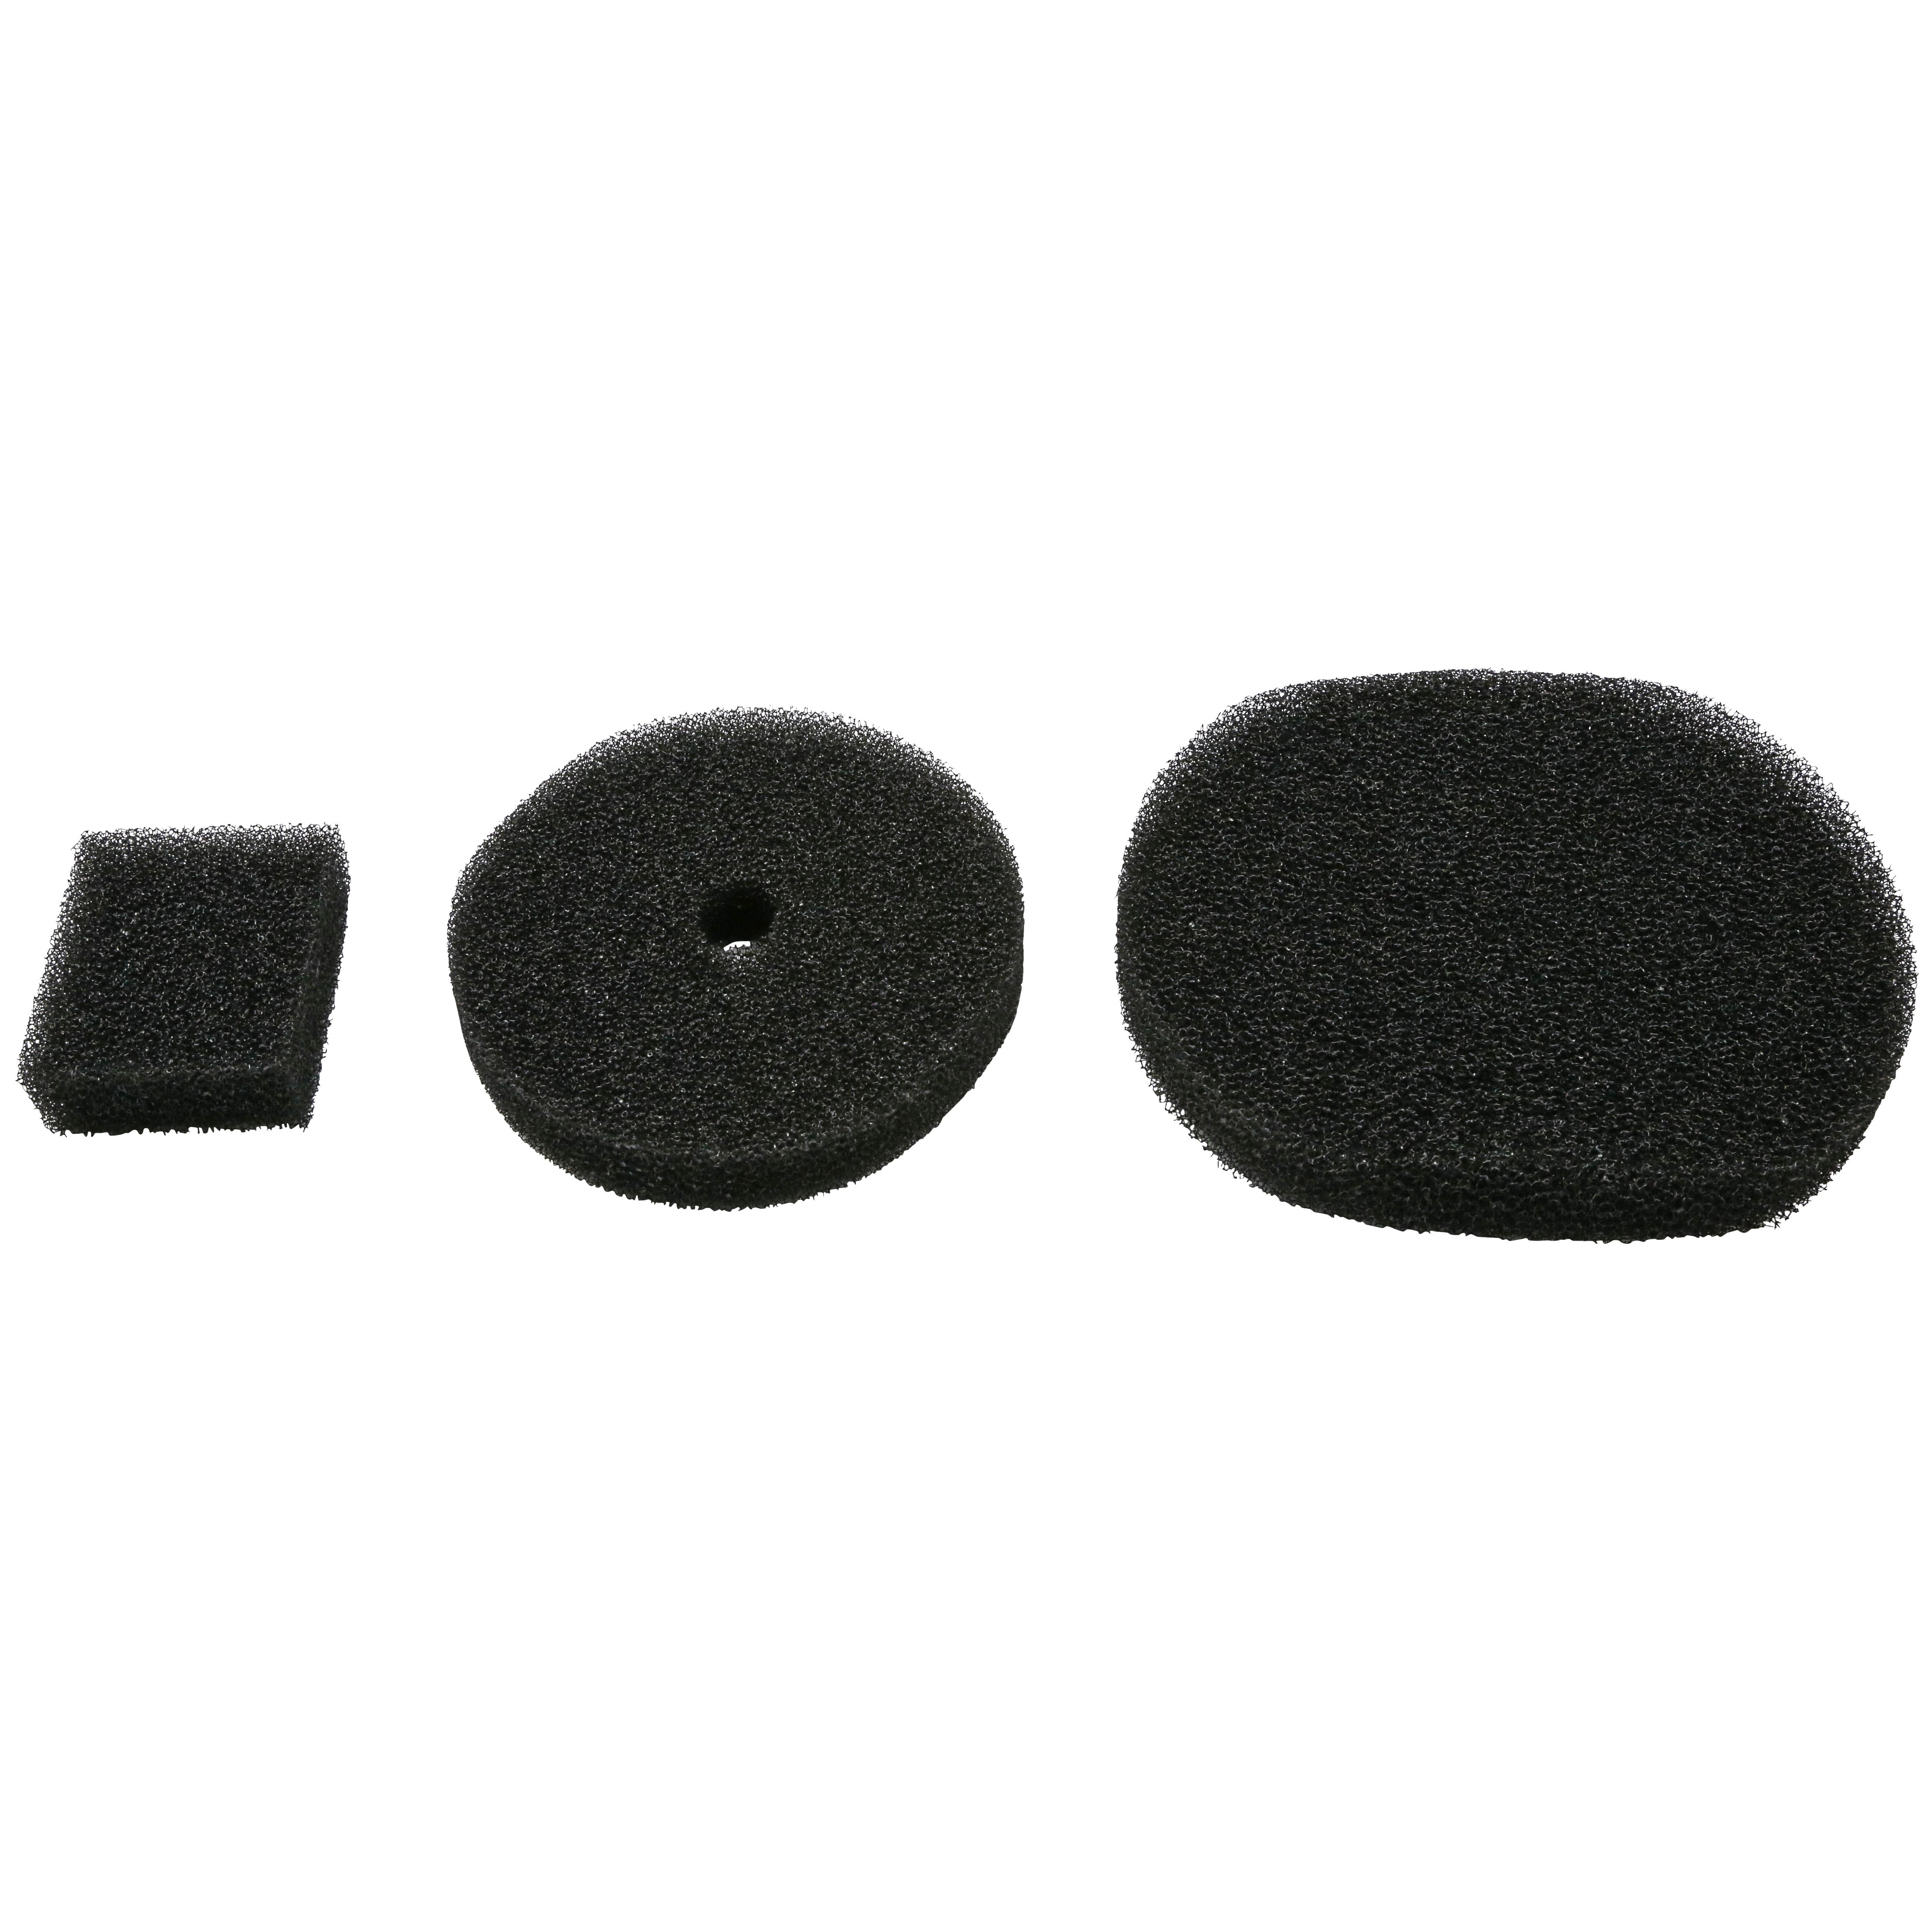 GLM013 Replacement Sponge for FM150 - Skimz